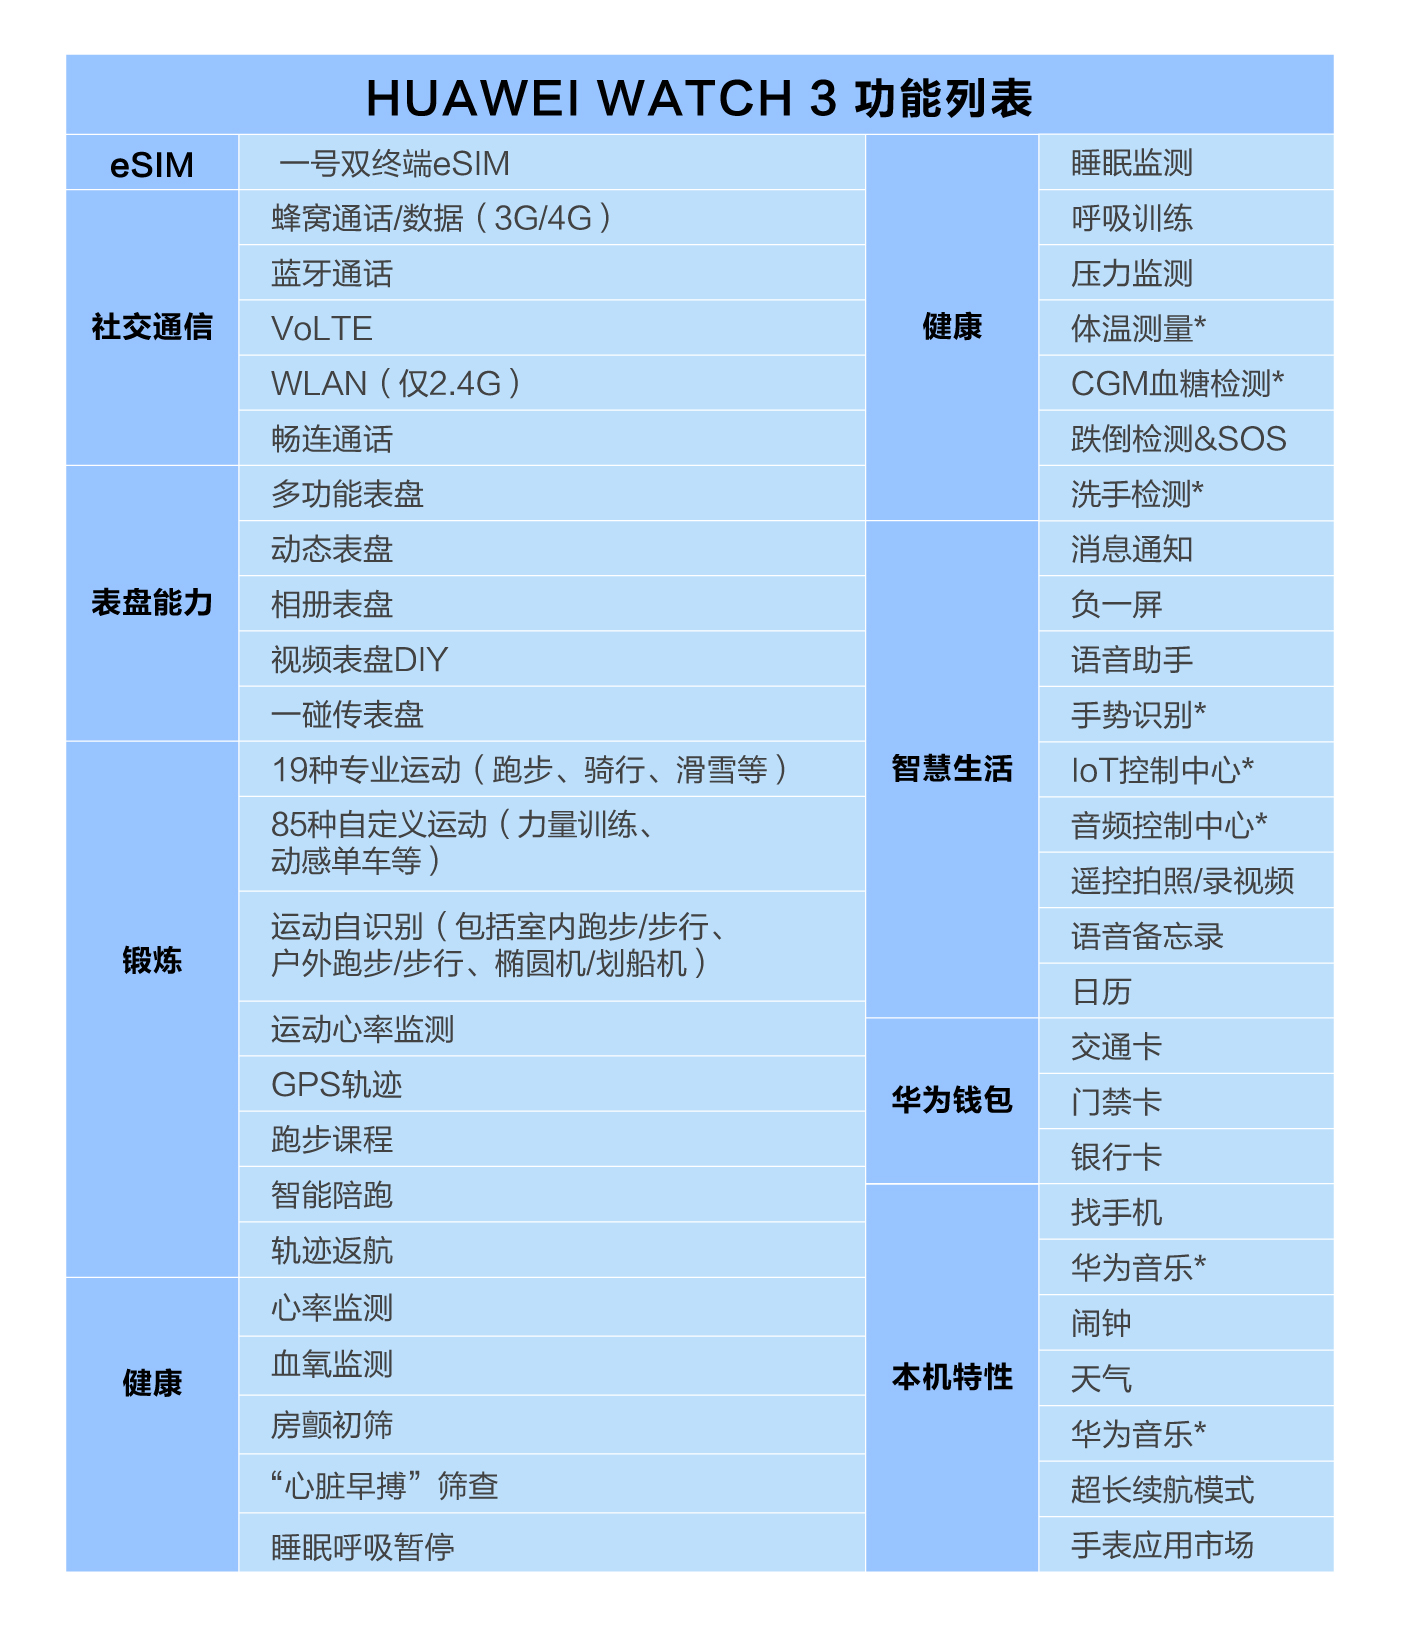 HUAWEI WATCH 3 功能列表-01.jpg